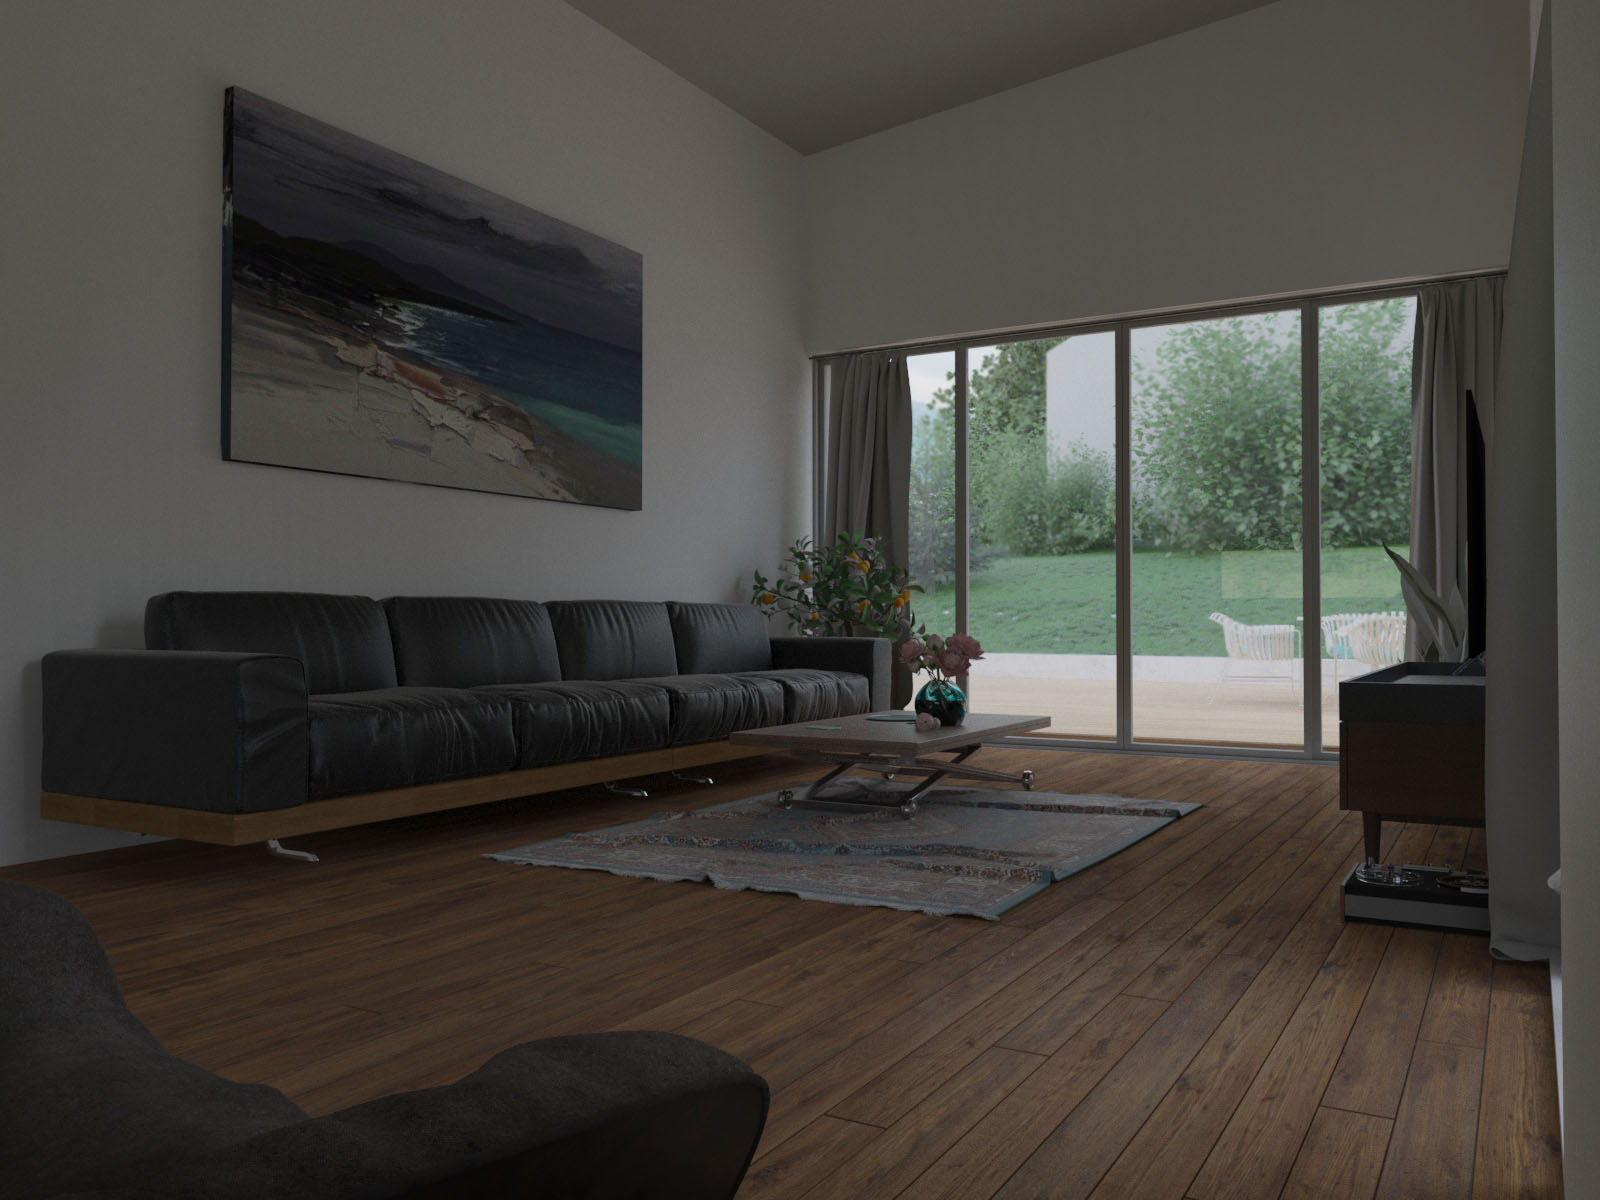 3ds max визуализация интерьера